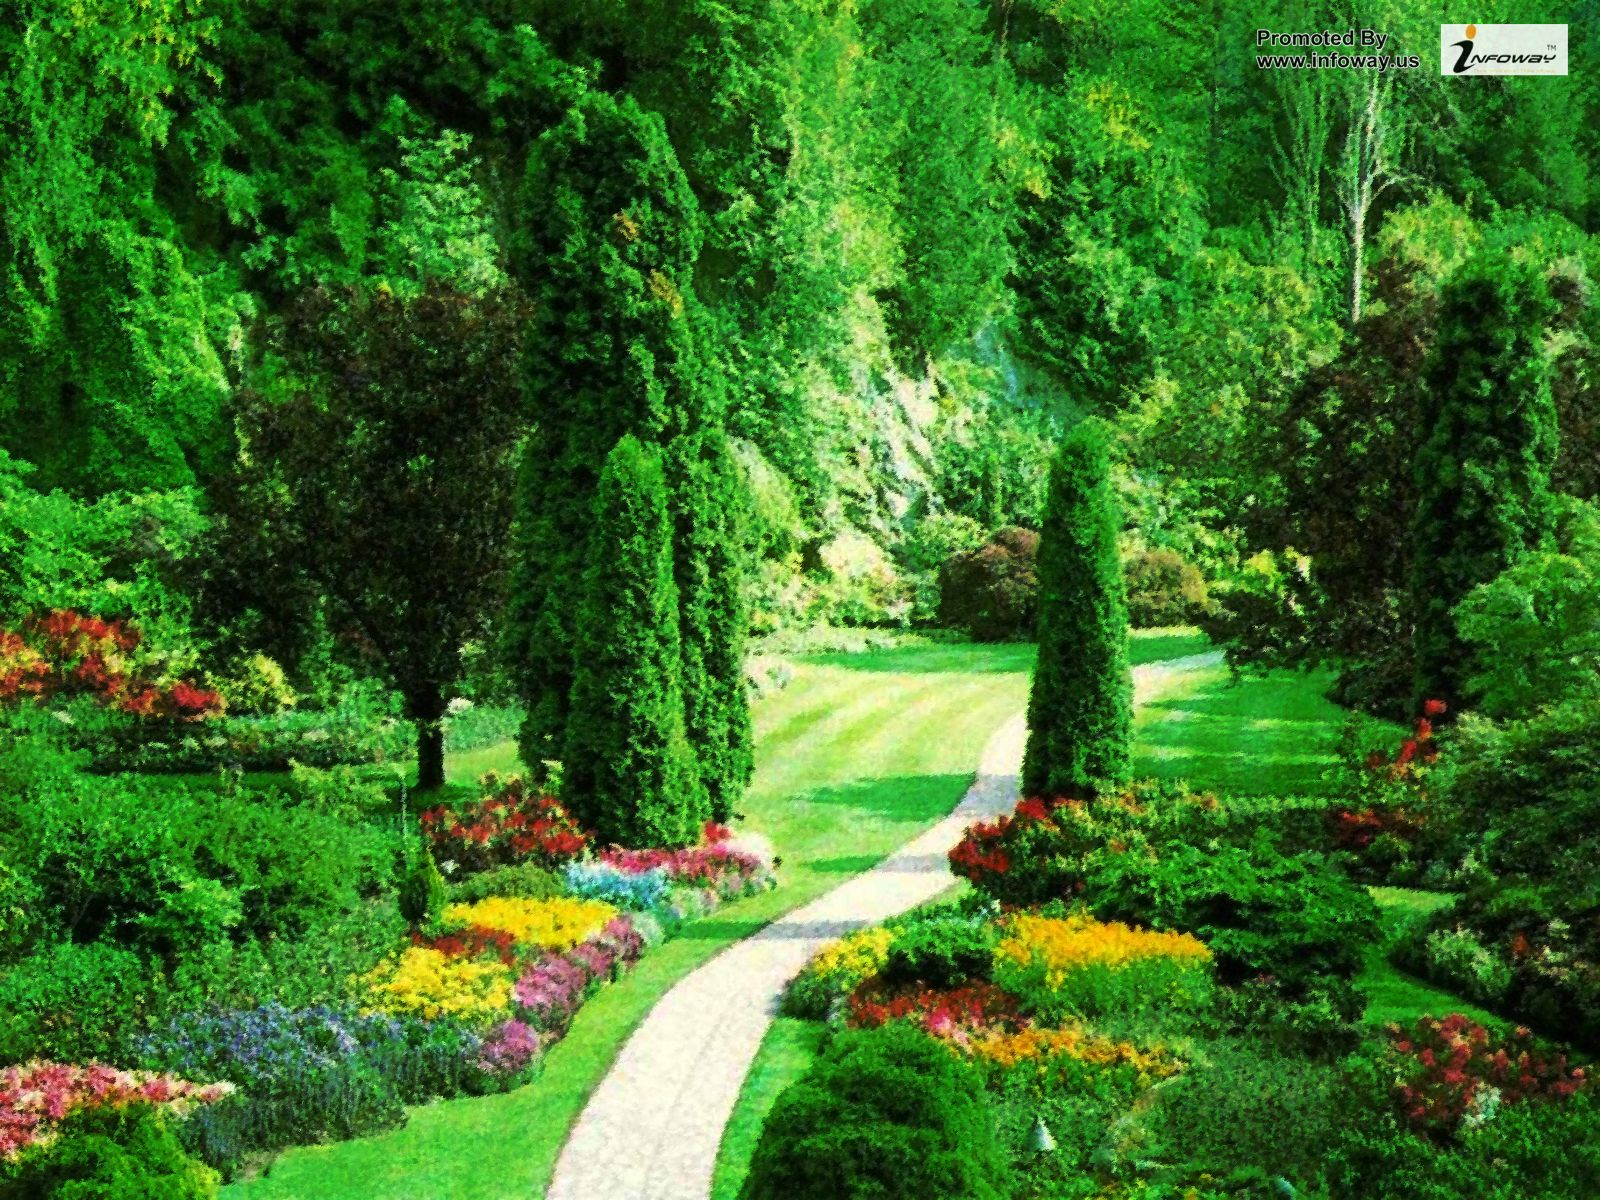 wallpaper nature 1600x1200,natural landscape,nature,vegetation,botanical garden,green